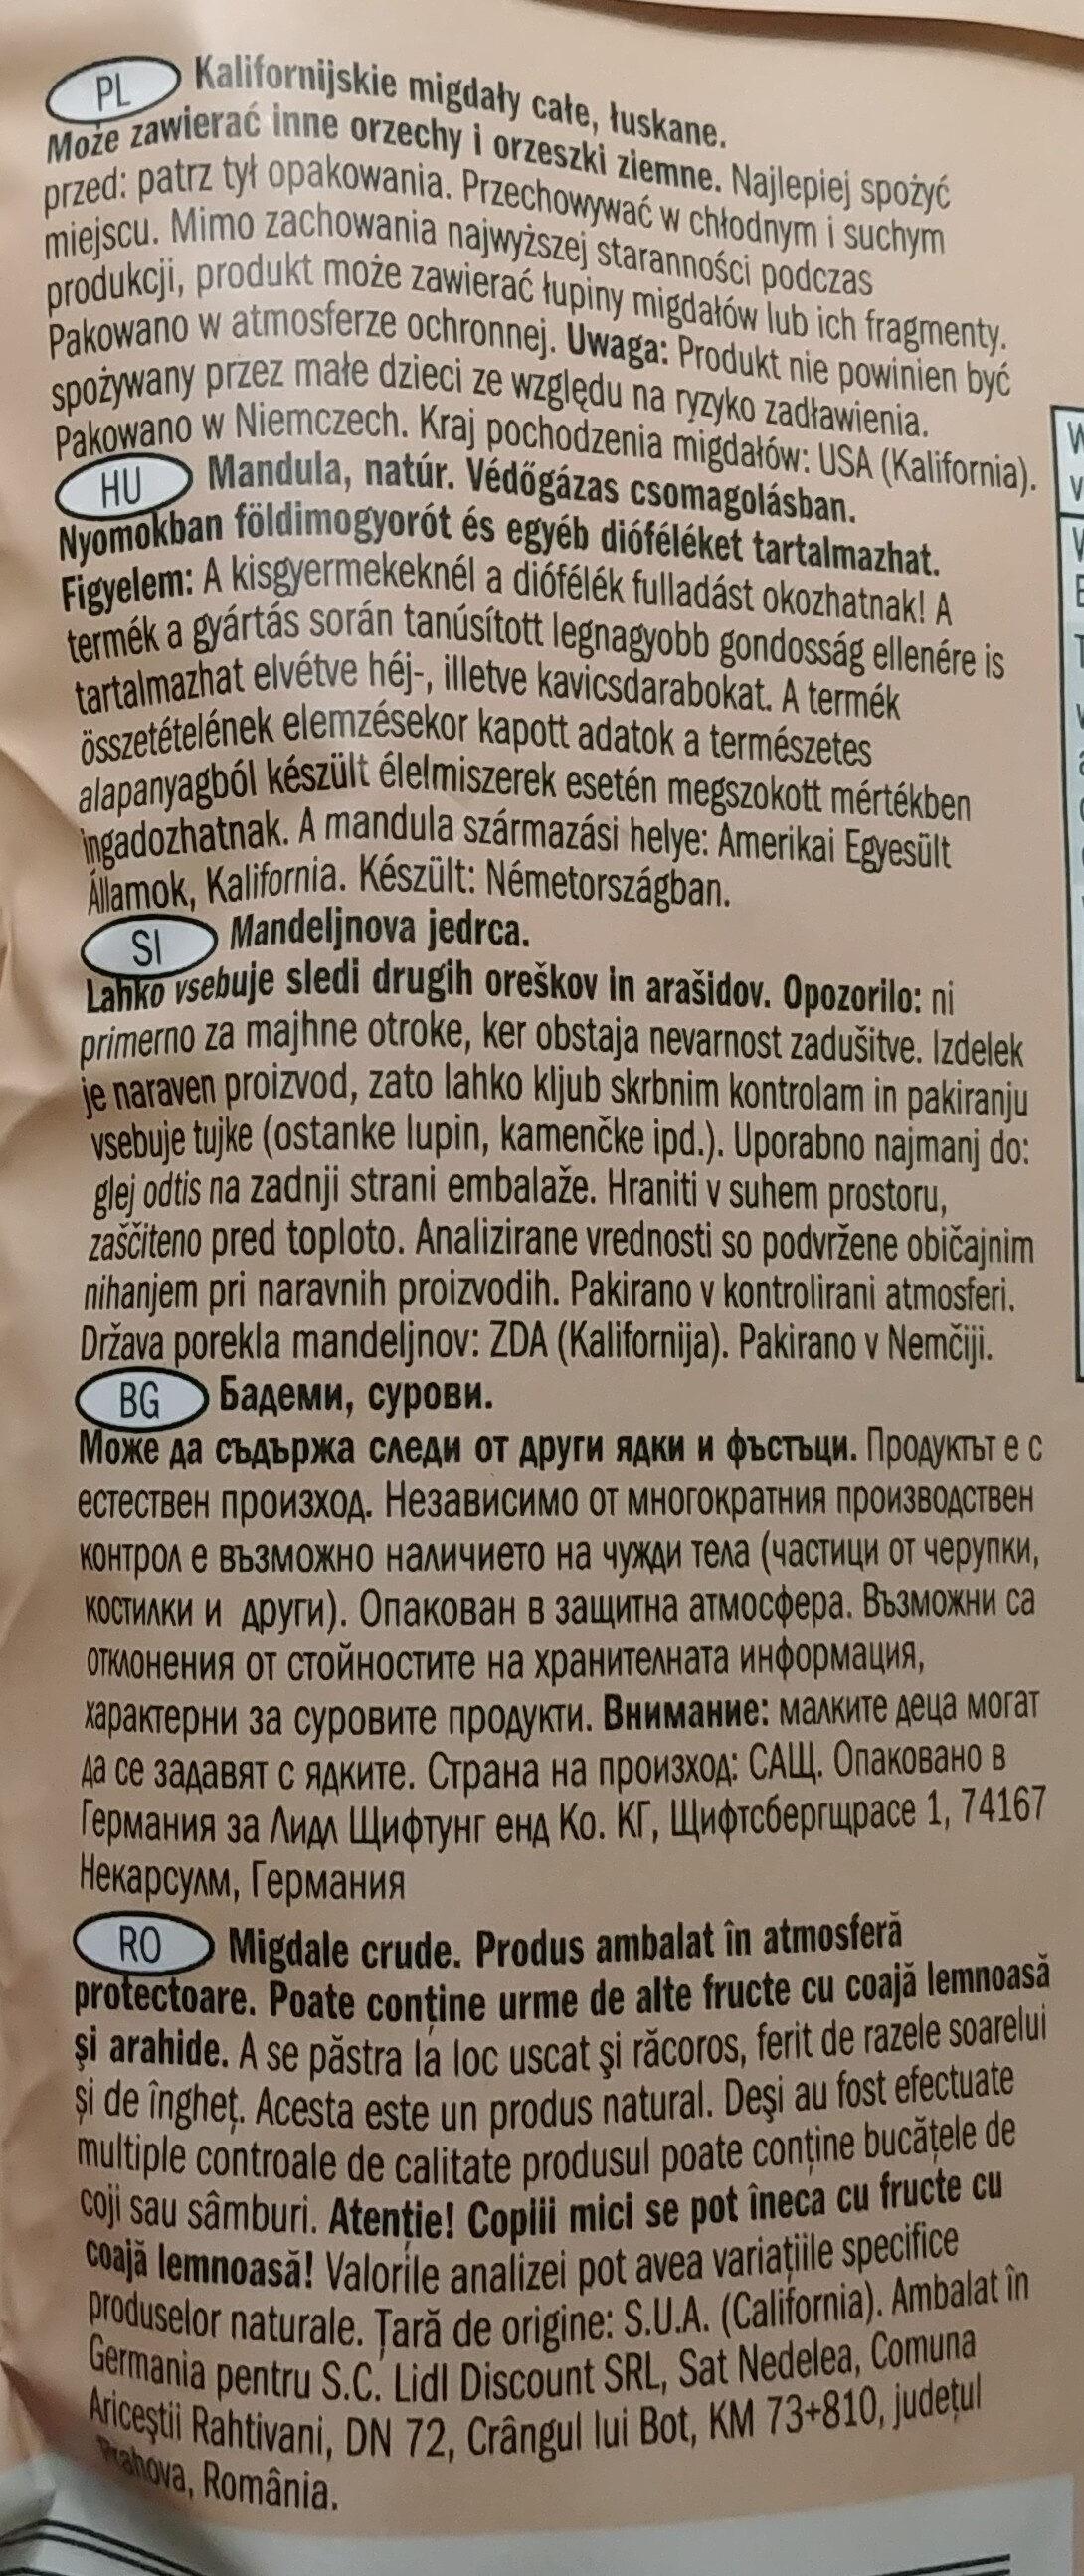 Kalofornische Mandeln, naturbelasen - Składniki - pl